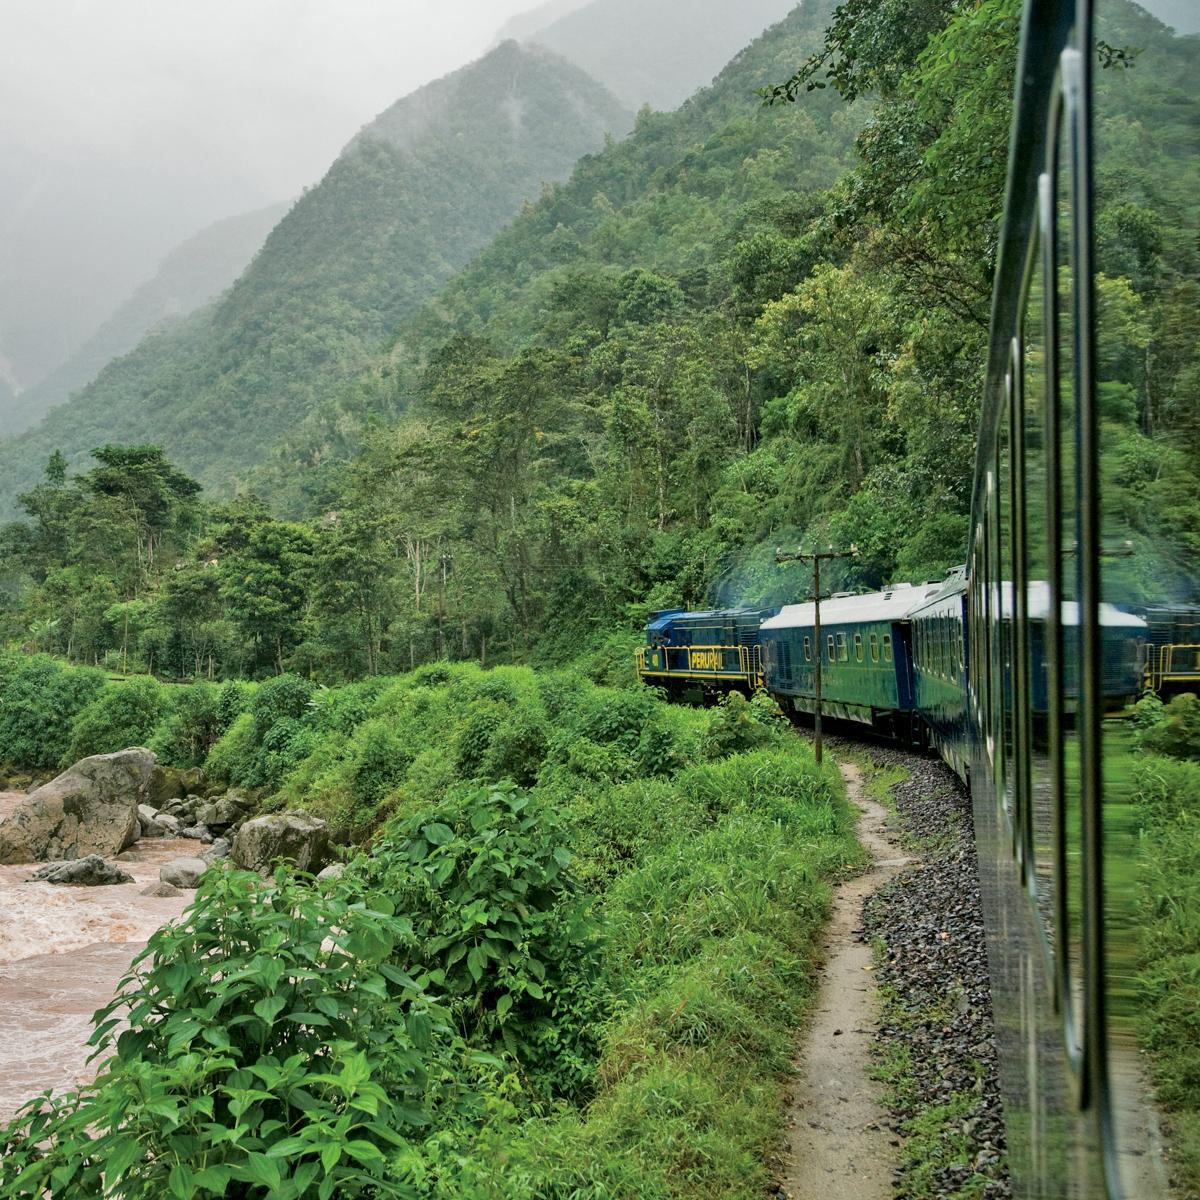 Belmond Hiram Bingham – Mit dem Zug zum Machu Picchu